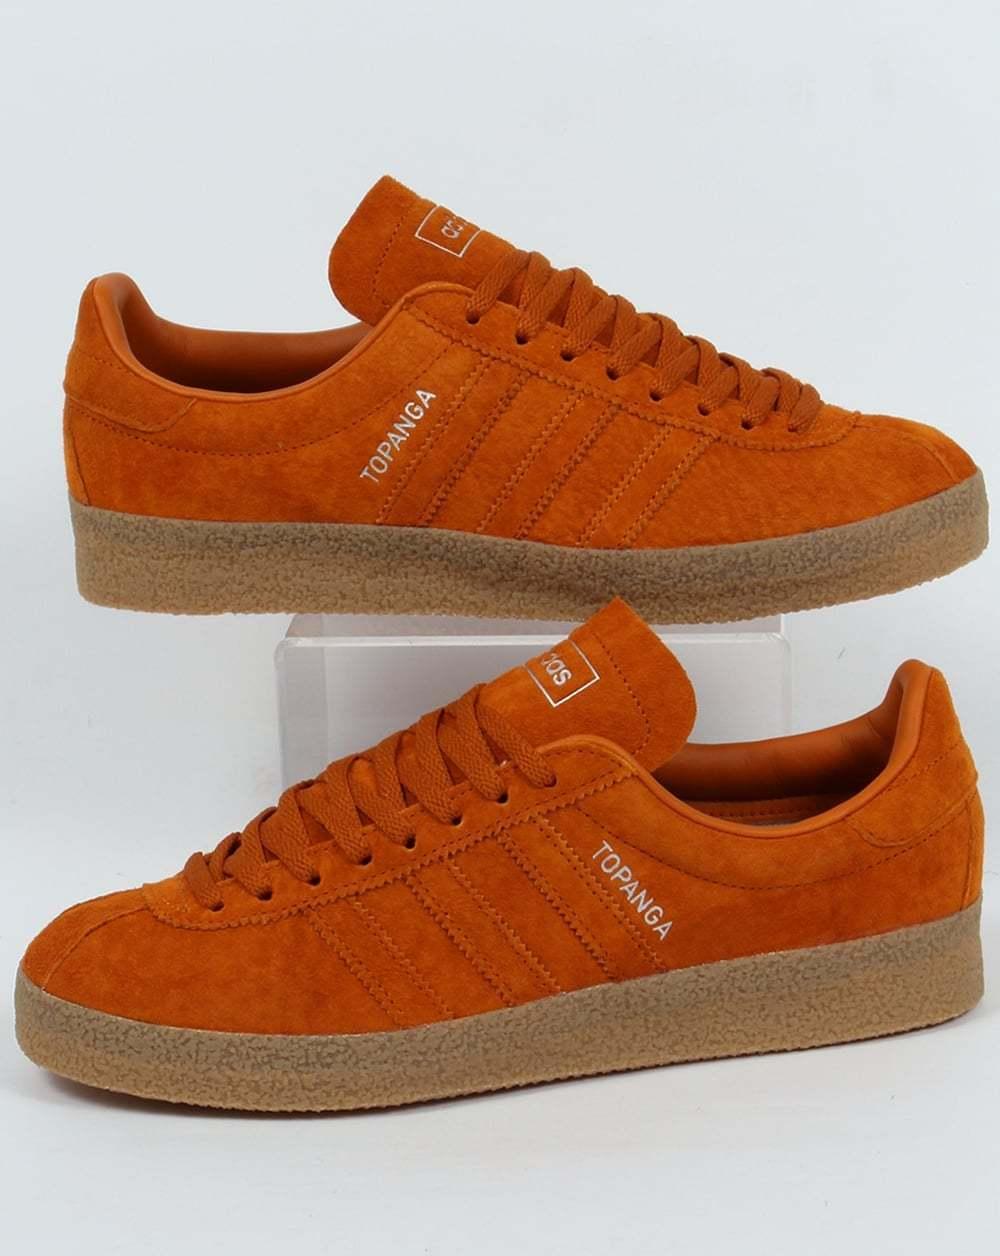 new styles 4a7c1 8c54a Adidas Originals - Adidas Topanga Trainers in Craft Ochre Orange suede gum  new